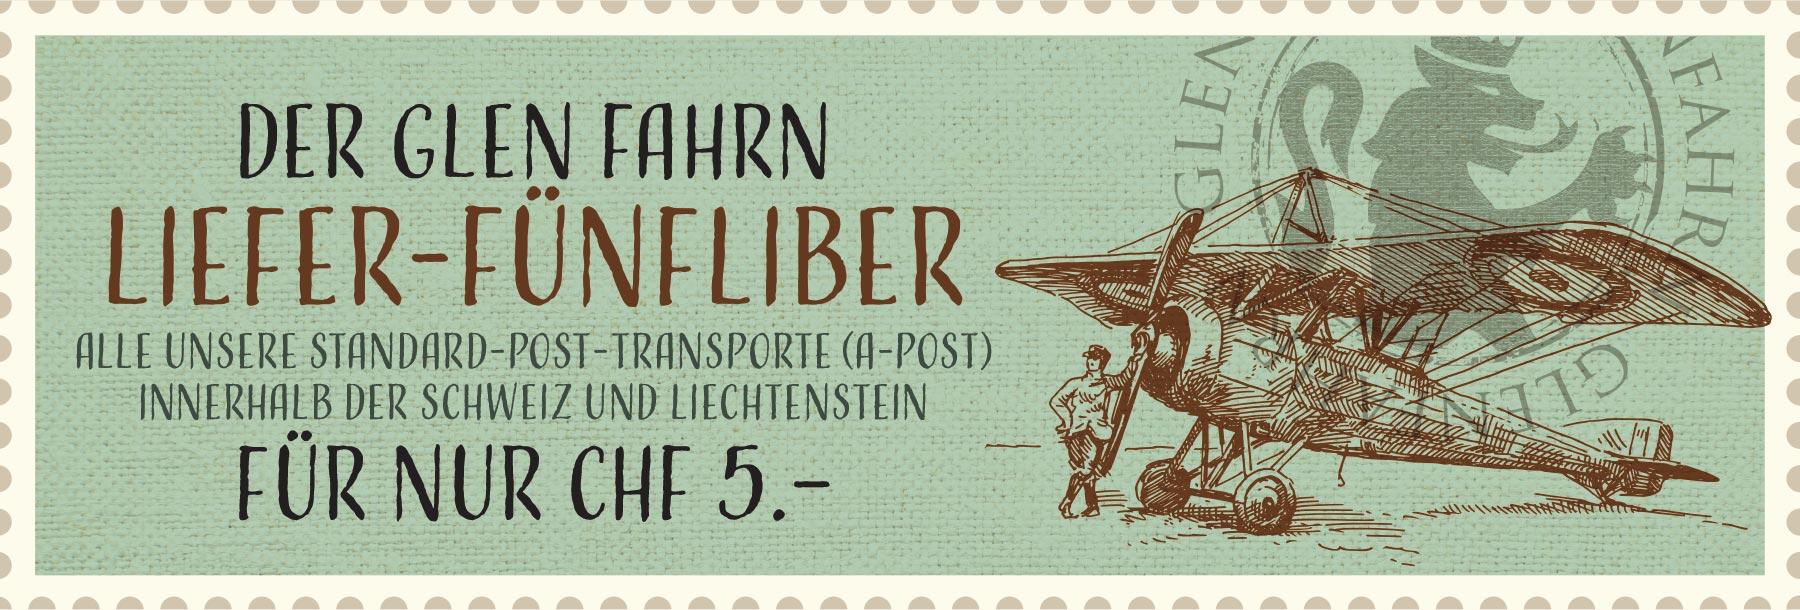 Glen Fahrn Liefer-Fünflieber Transport Kosten